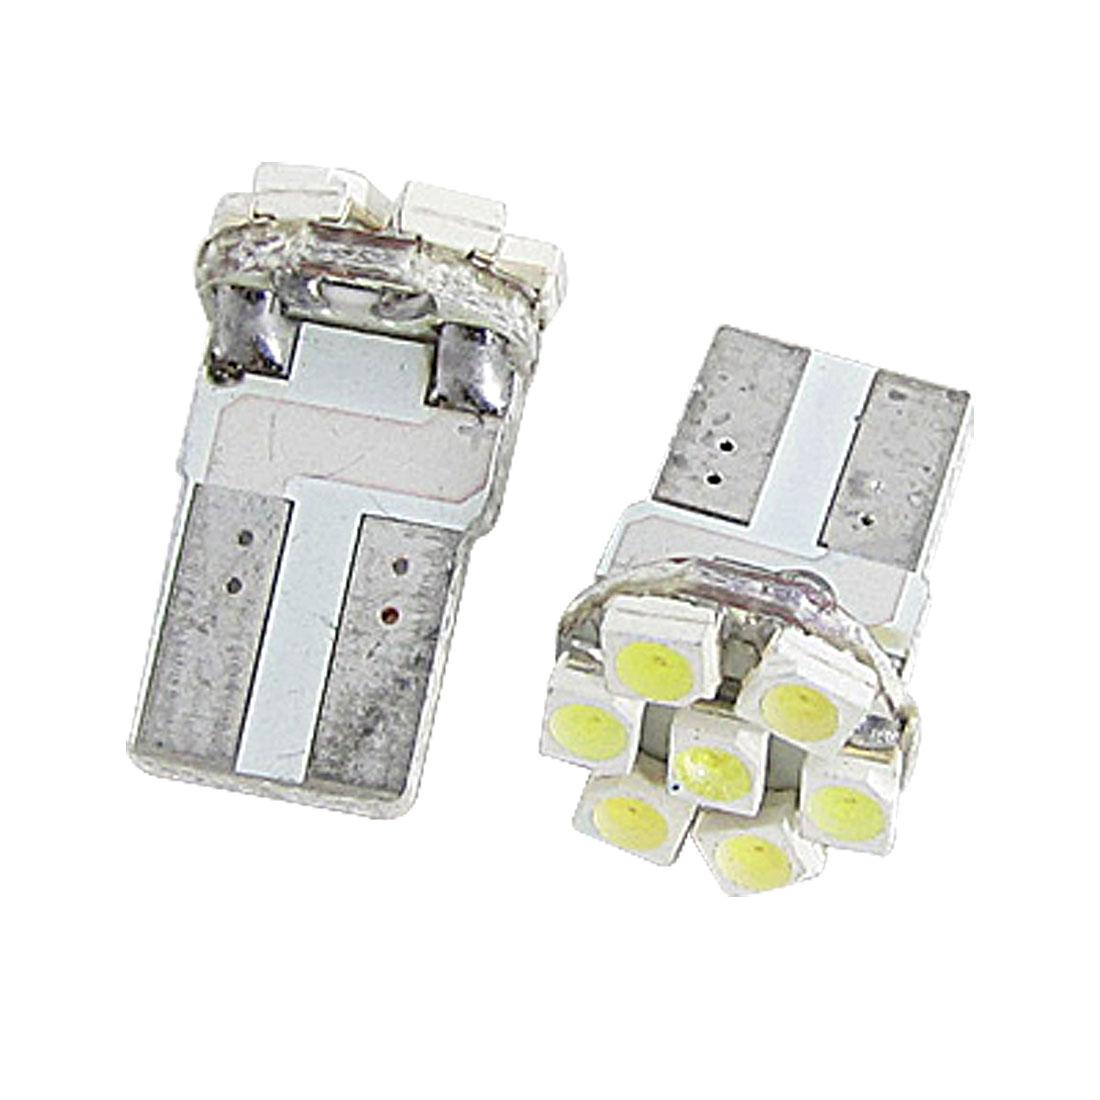 2 Pcs T10 W5W 7 1210 SMD LED White Turn Signal Side Light Bulb